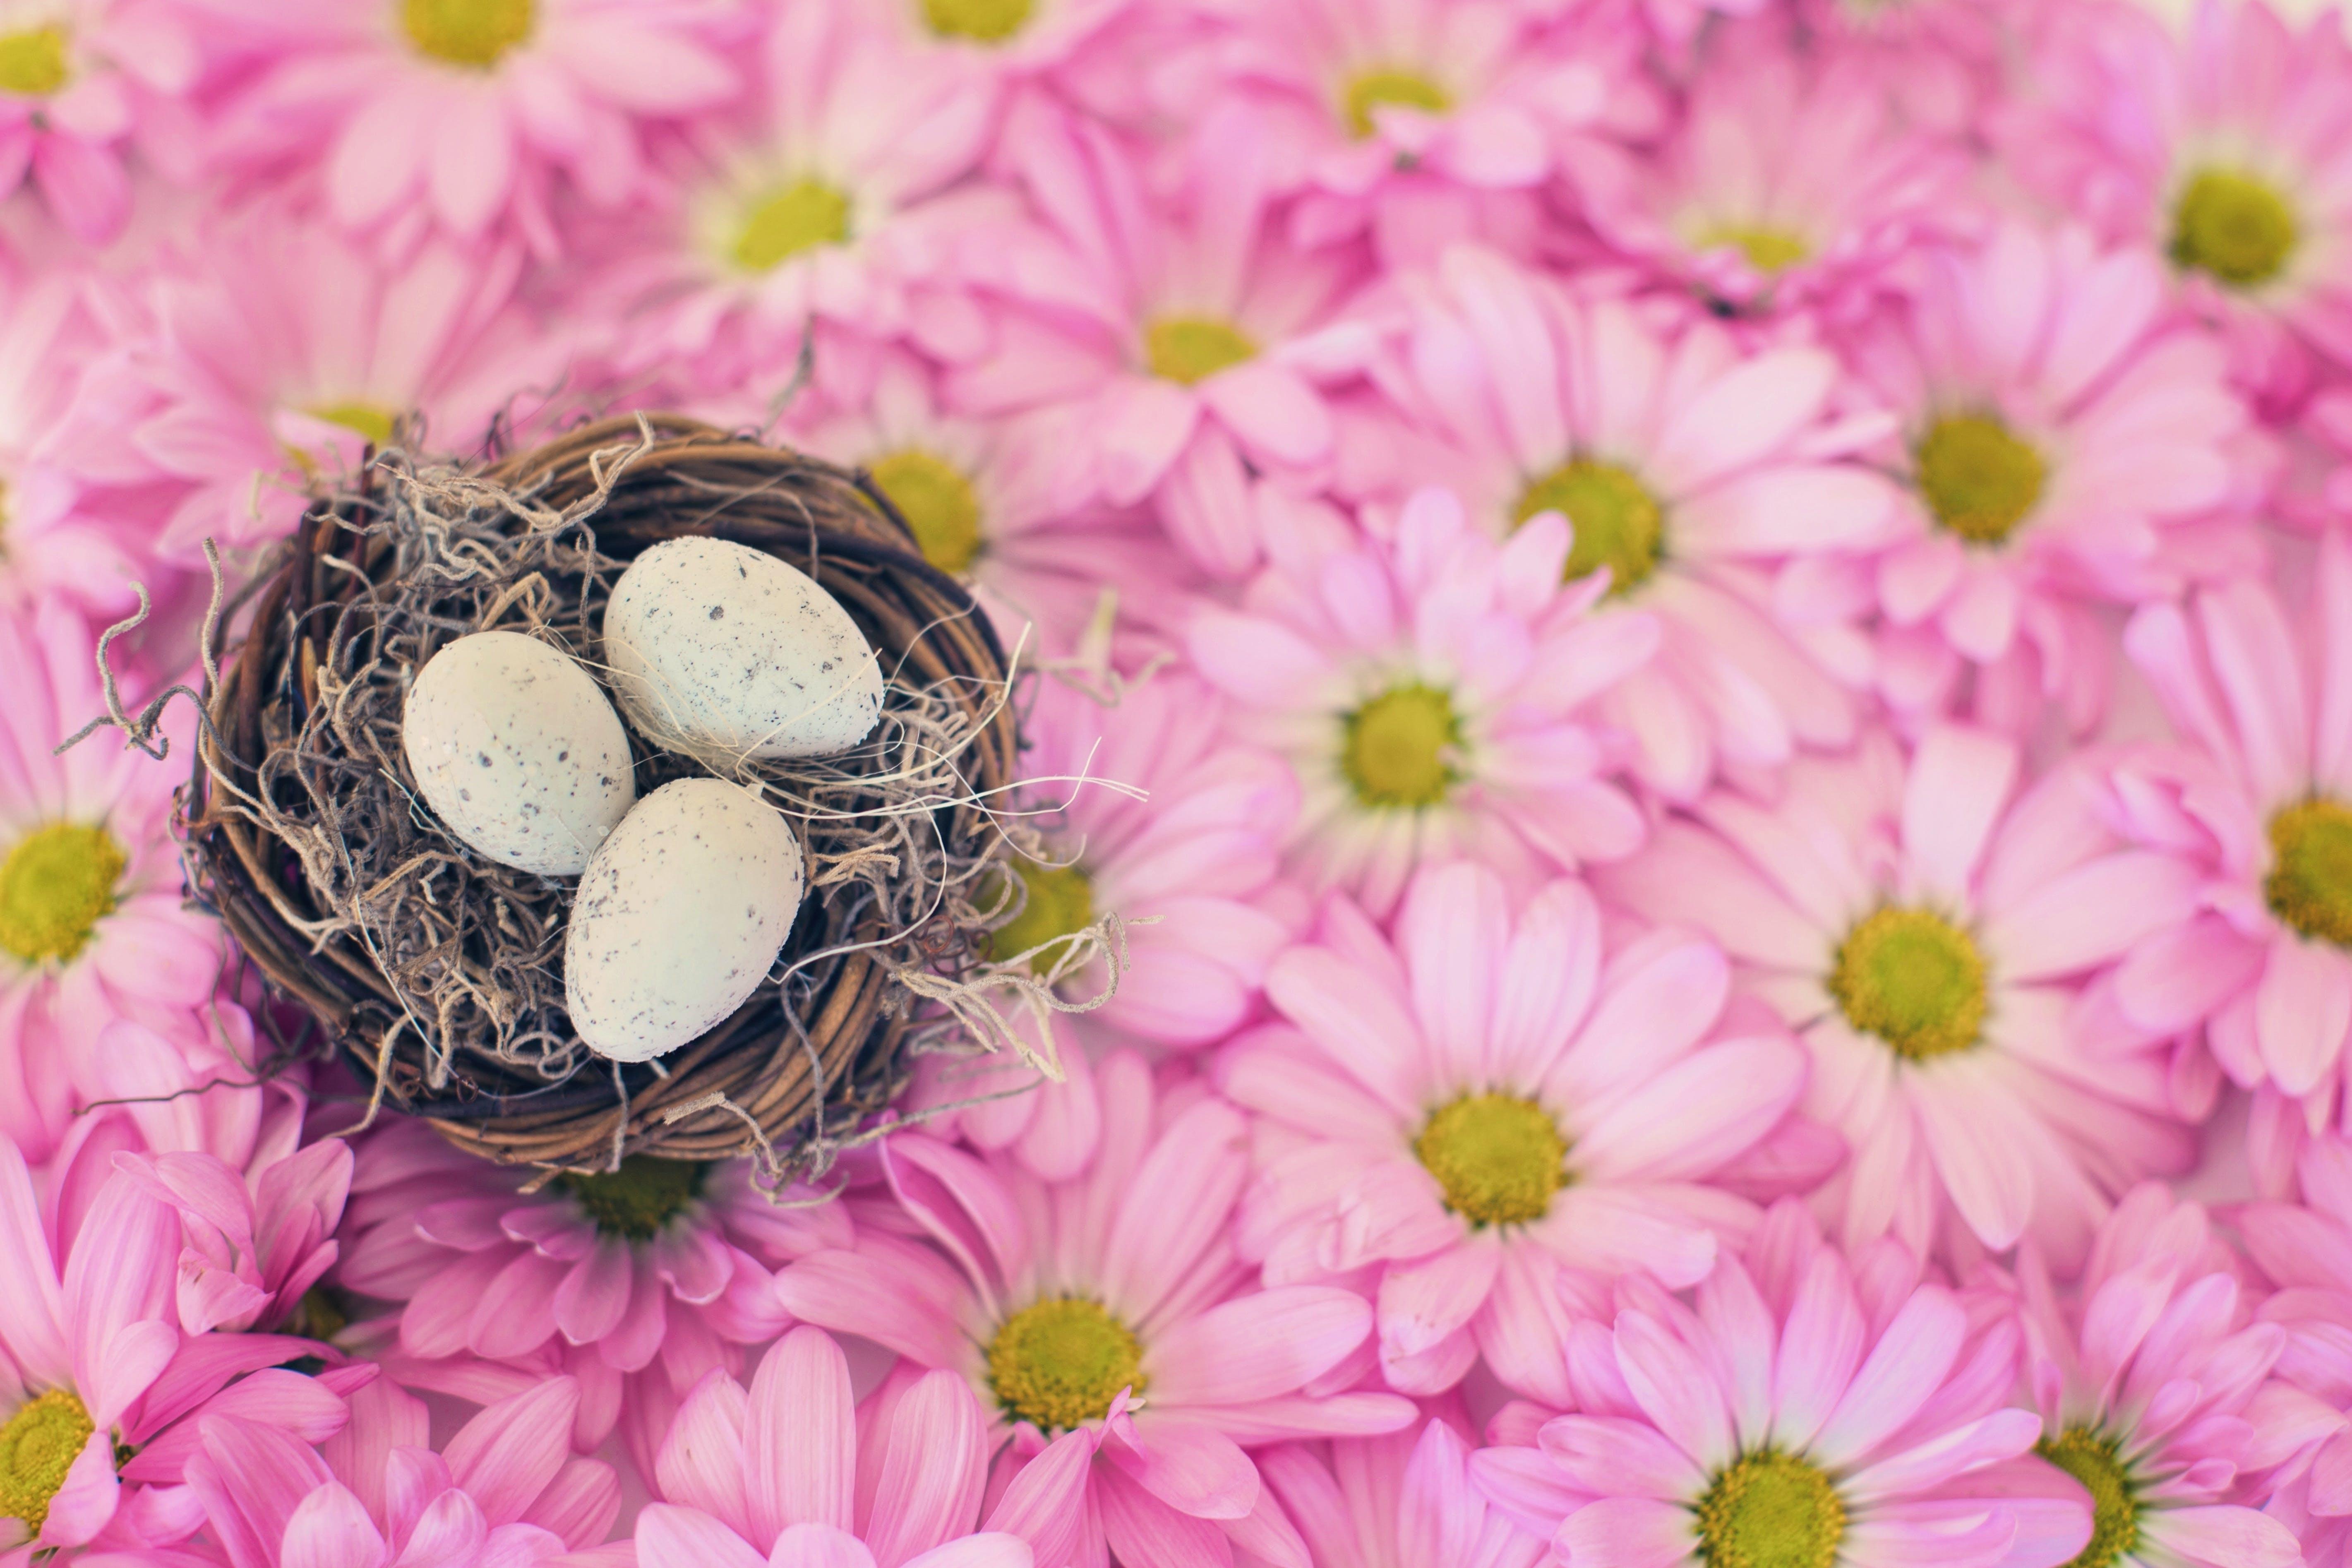 Free stock photo of nature, spring, easter, season